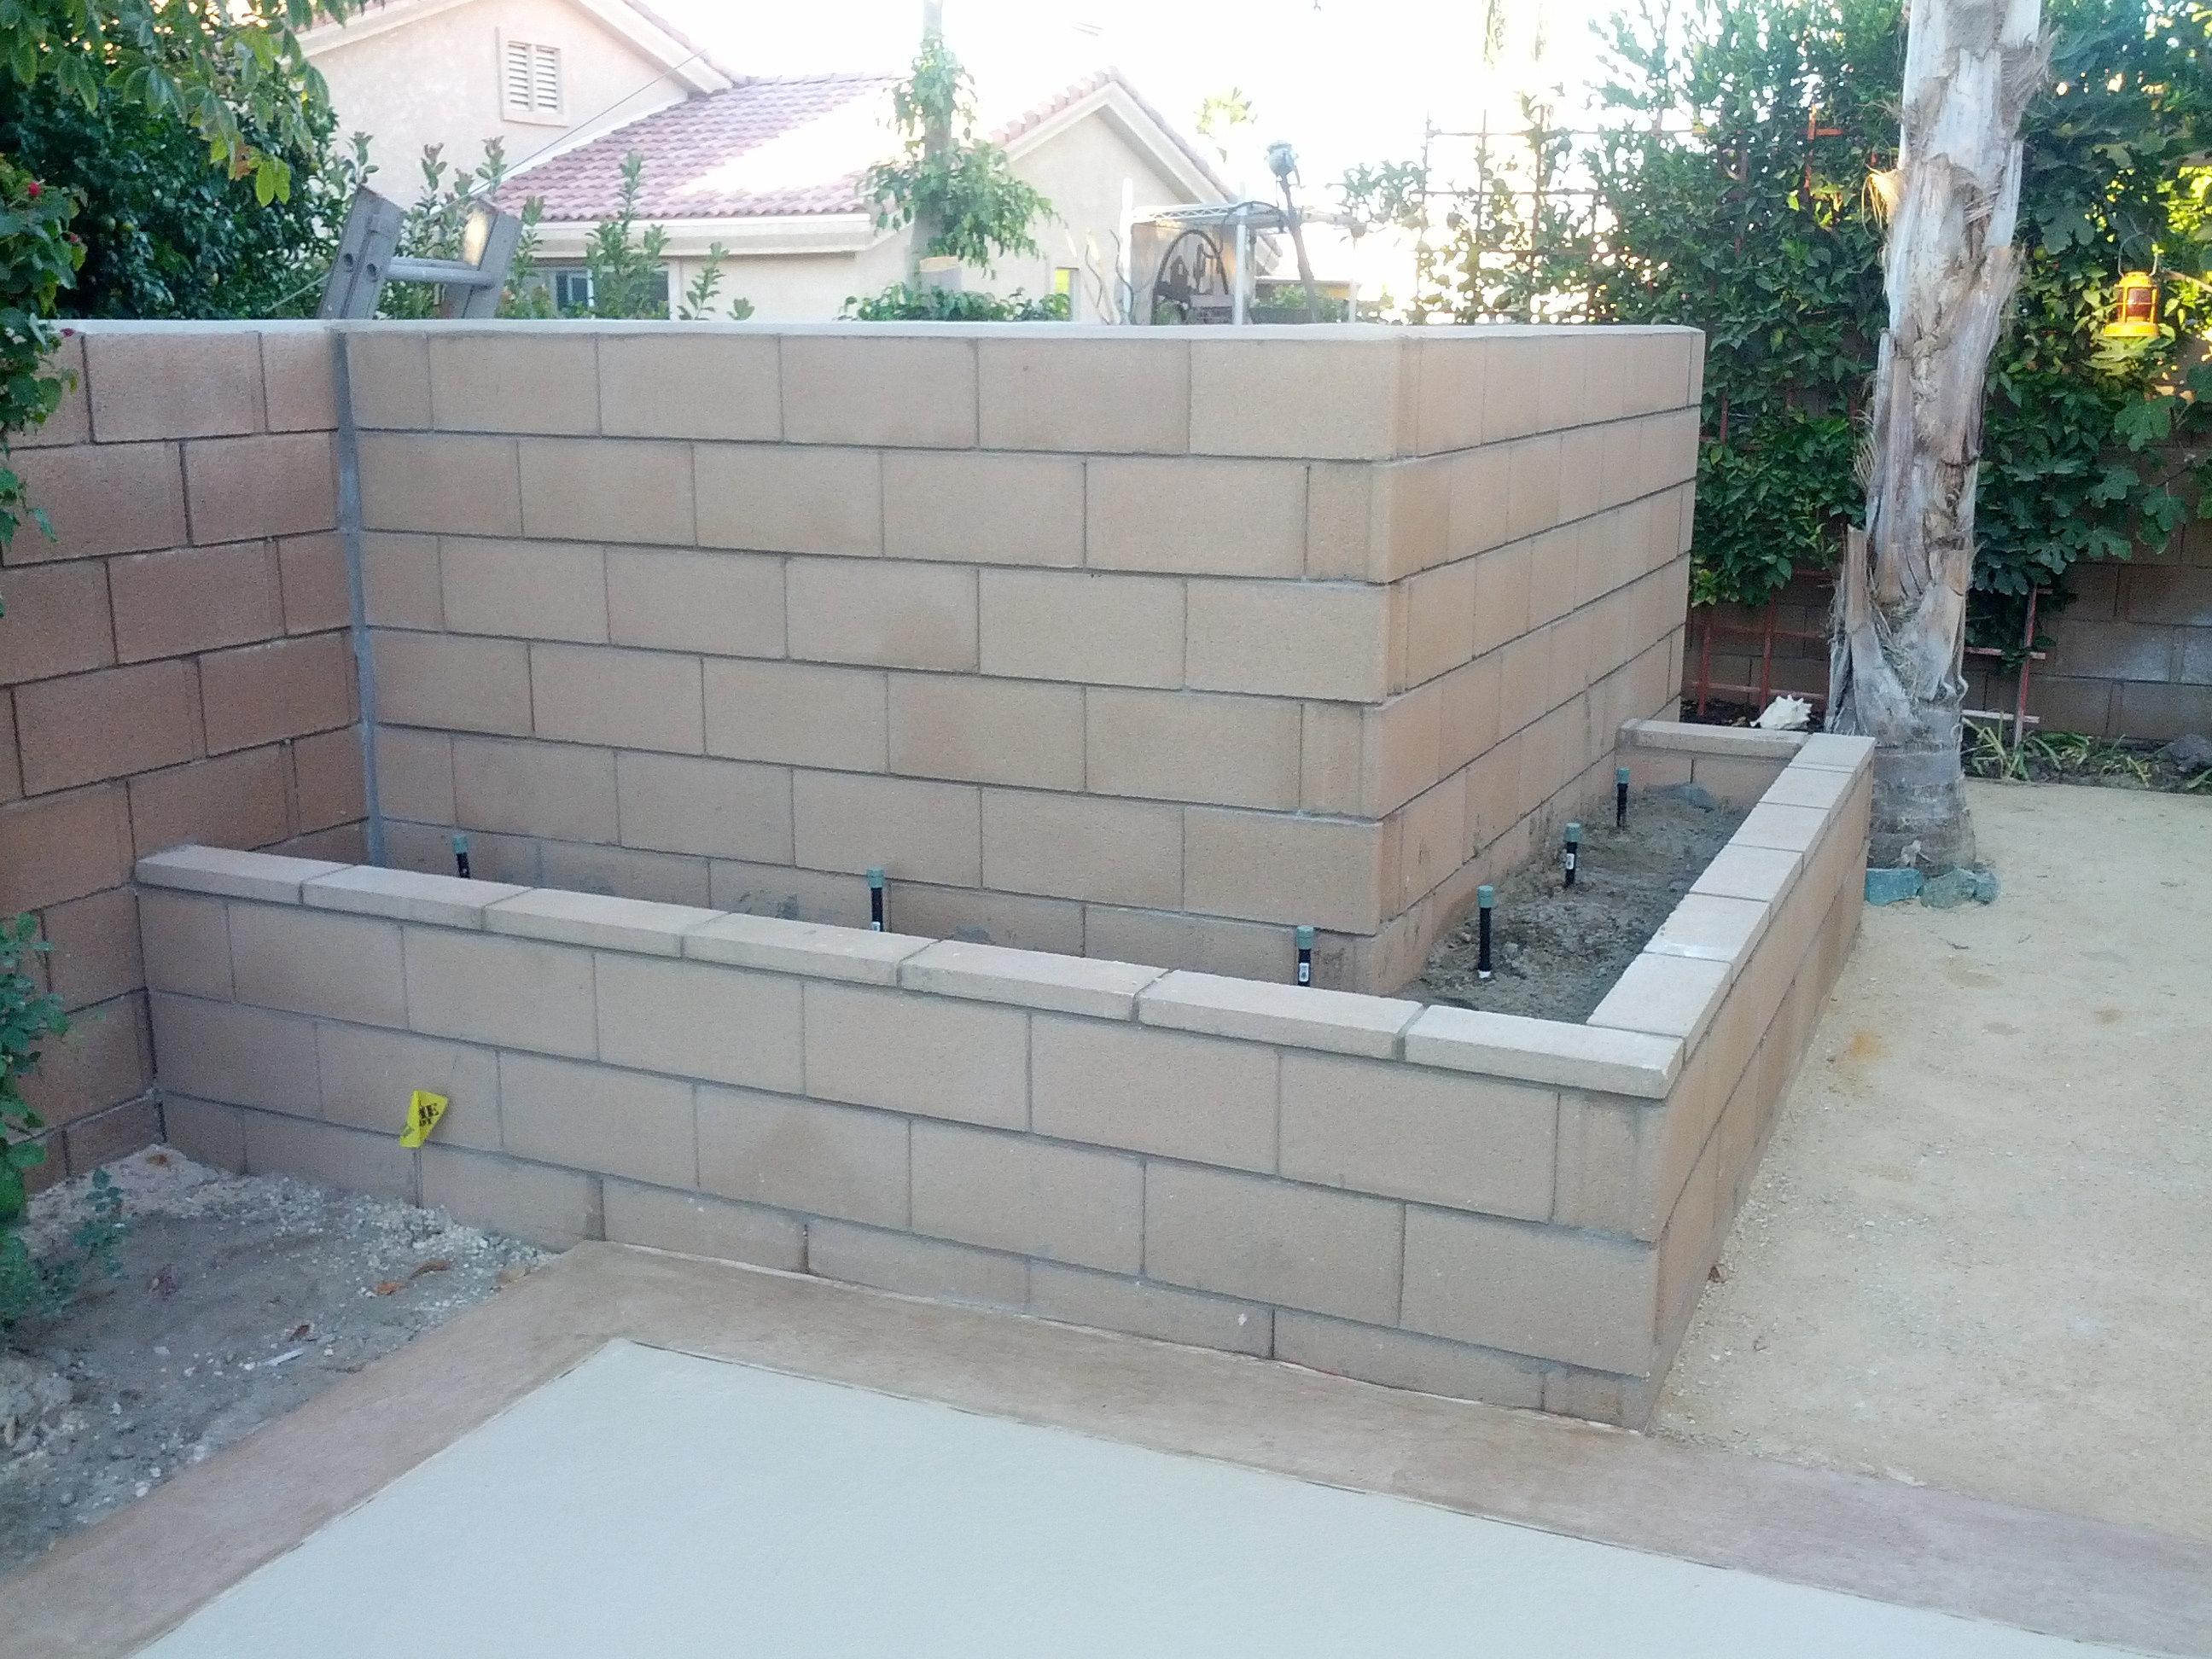 Indio Ca Concrete Services Reputable Contractor Champion Block Wall Around Pool Equipment